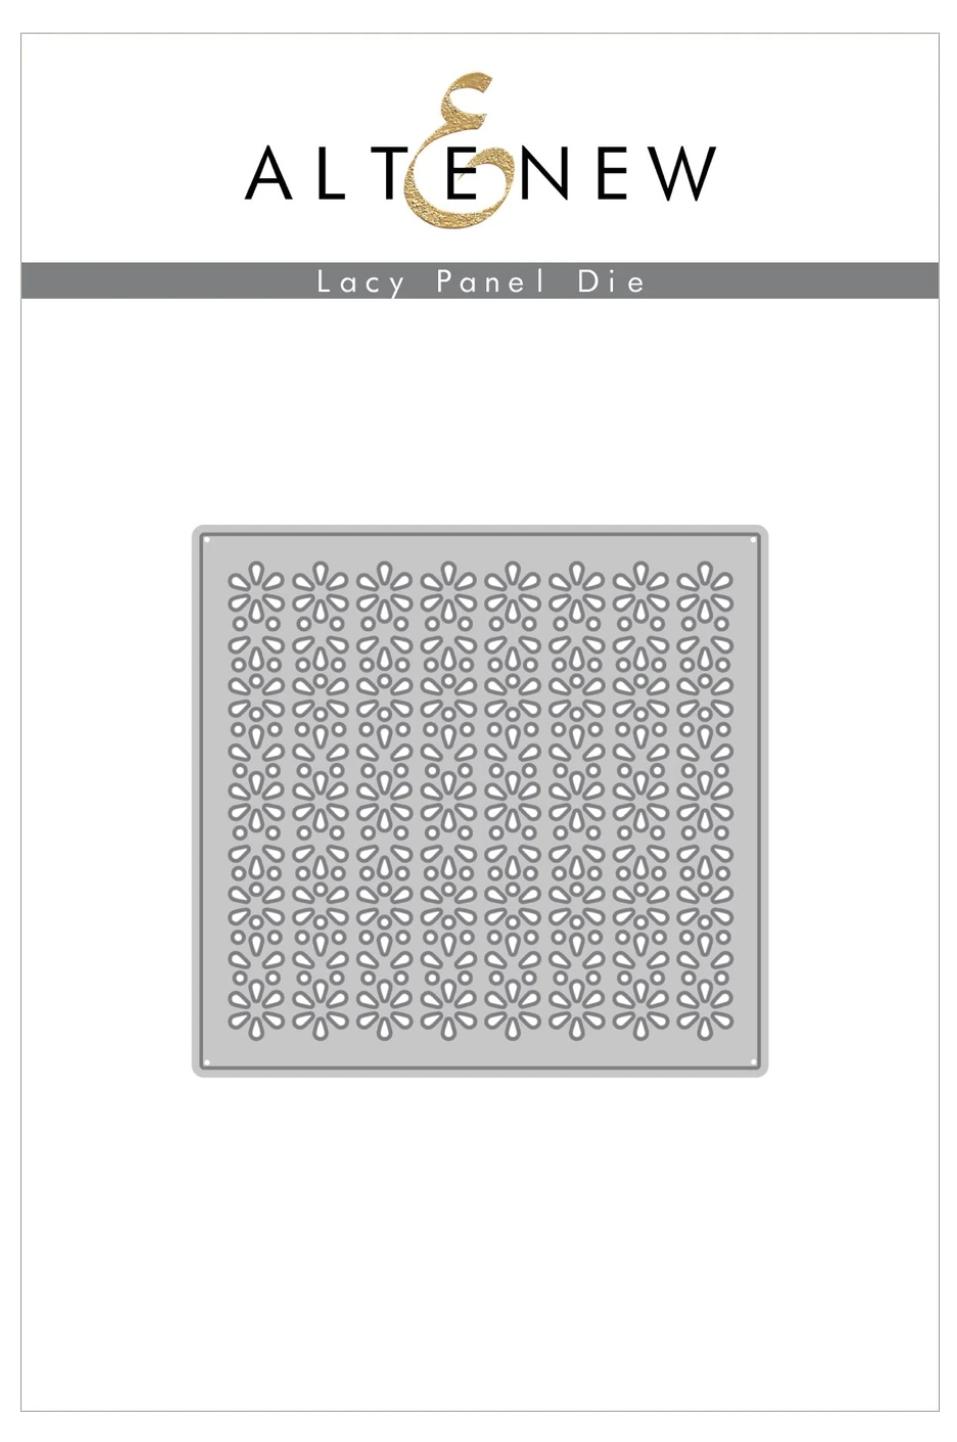 Altenew Lacy Panel Die